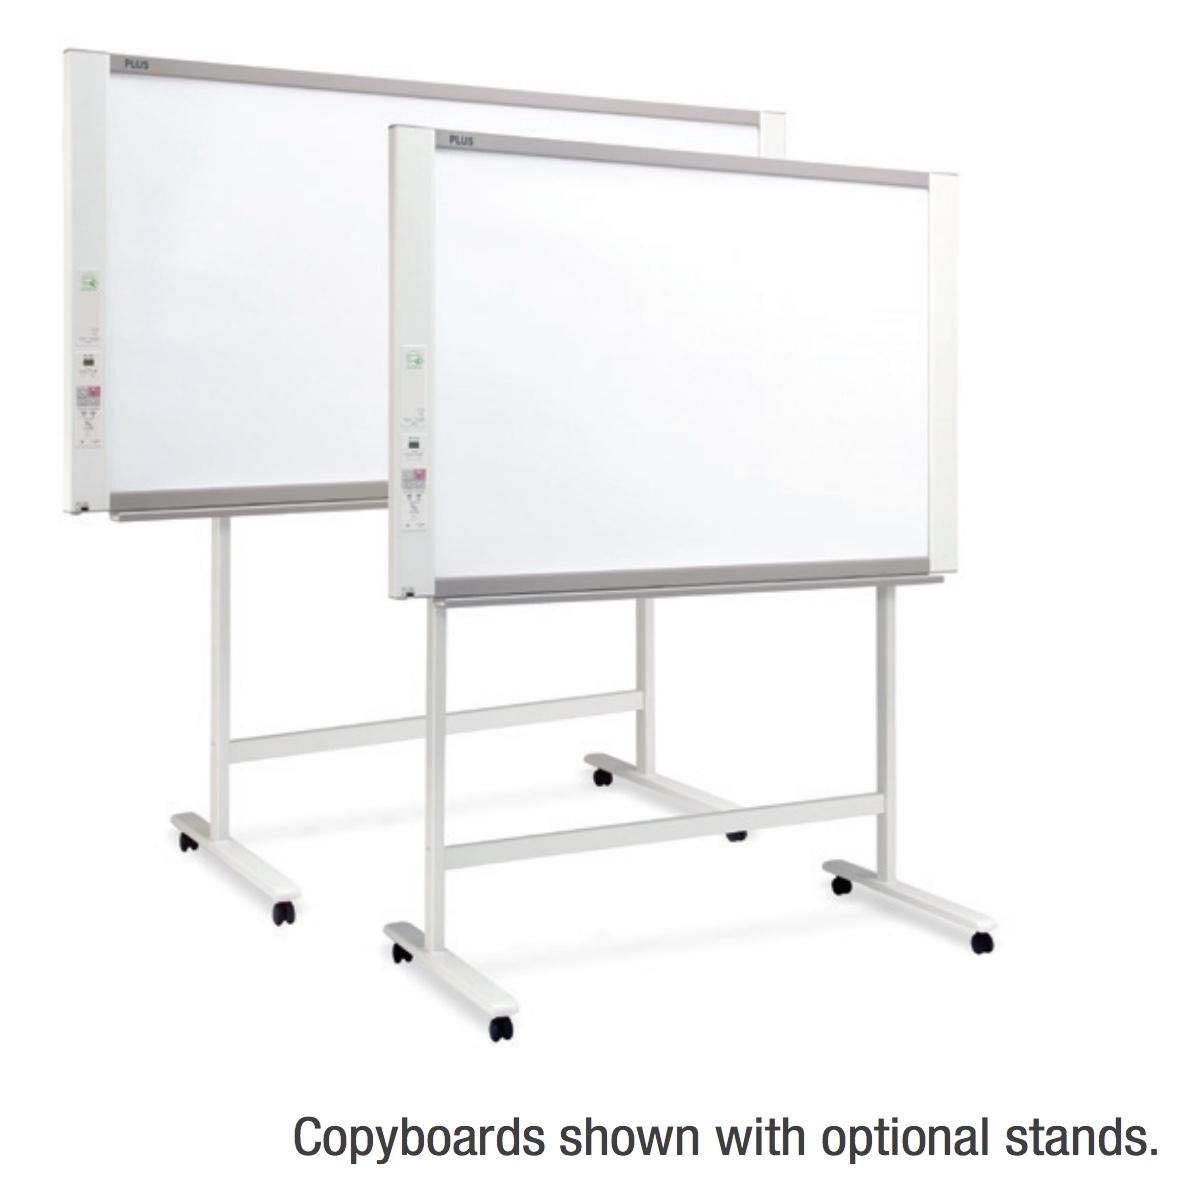 PLUS Whiteboards:  The PLUS Copyboard N-324